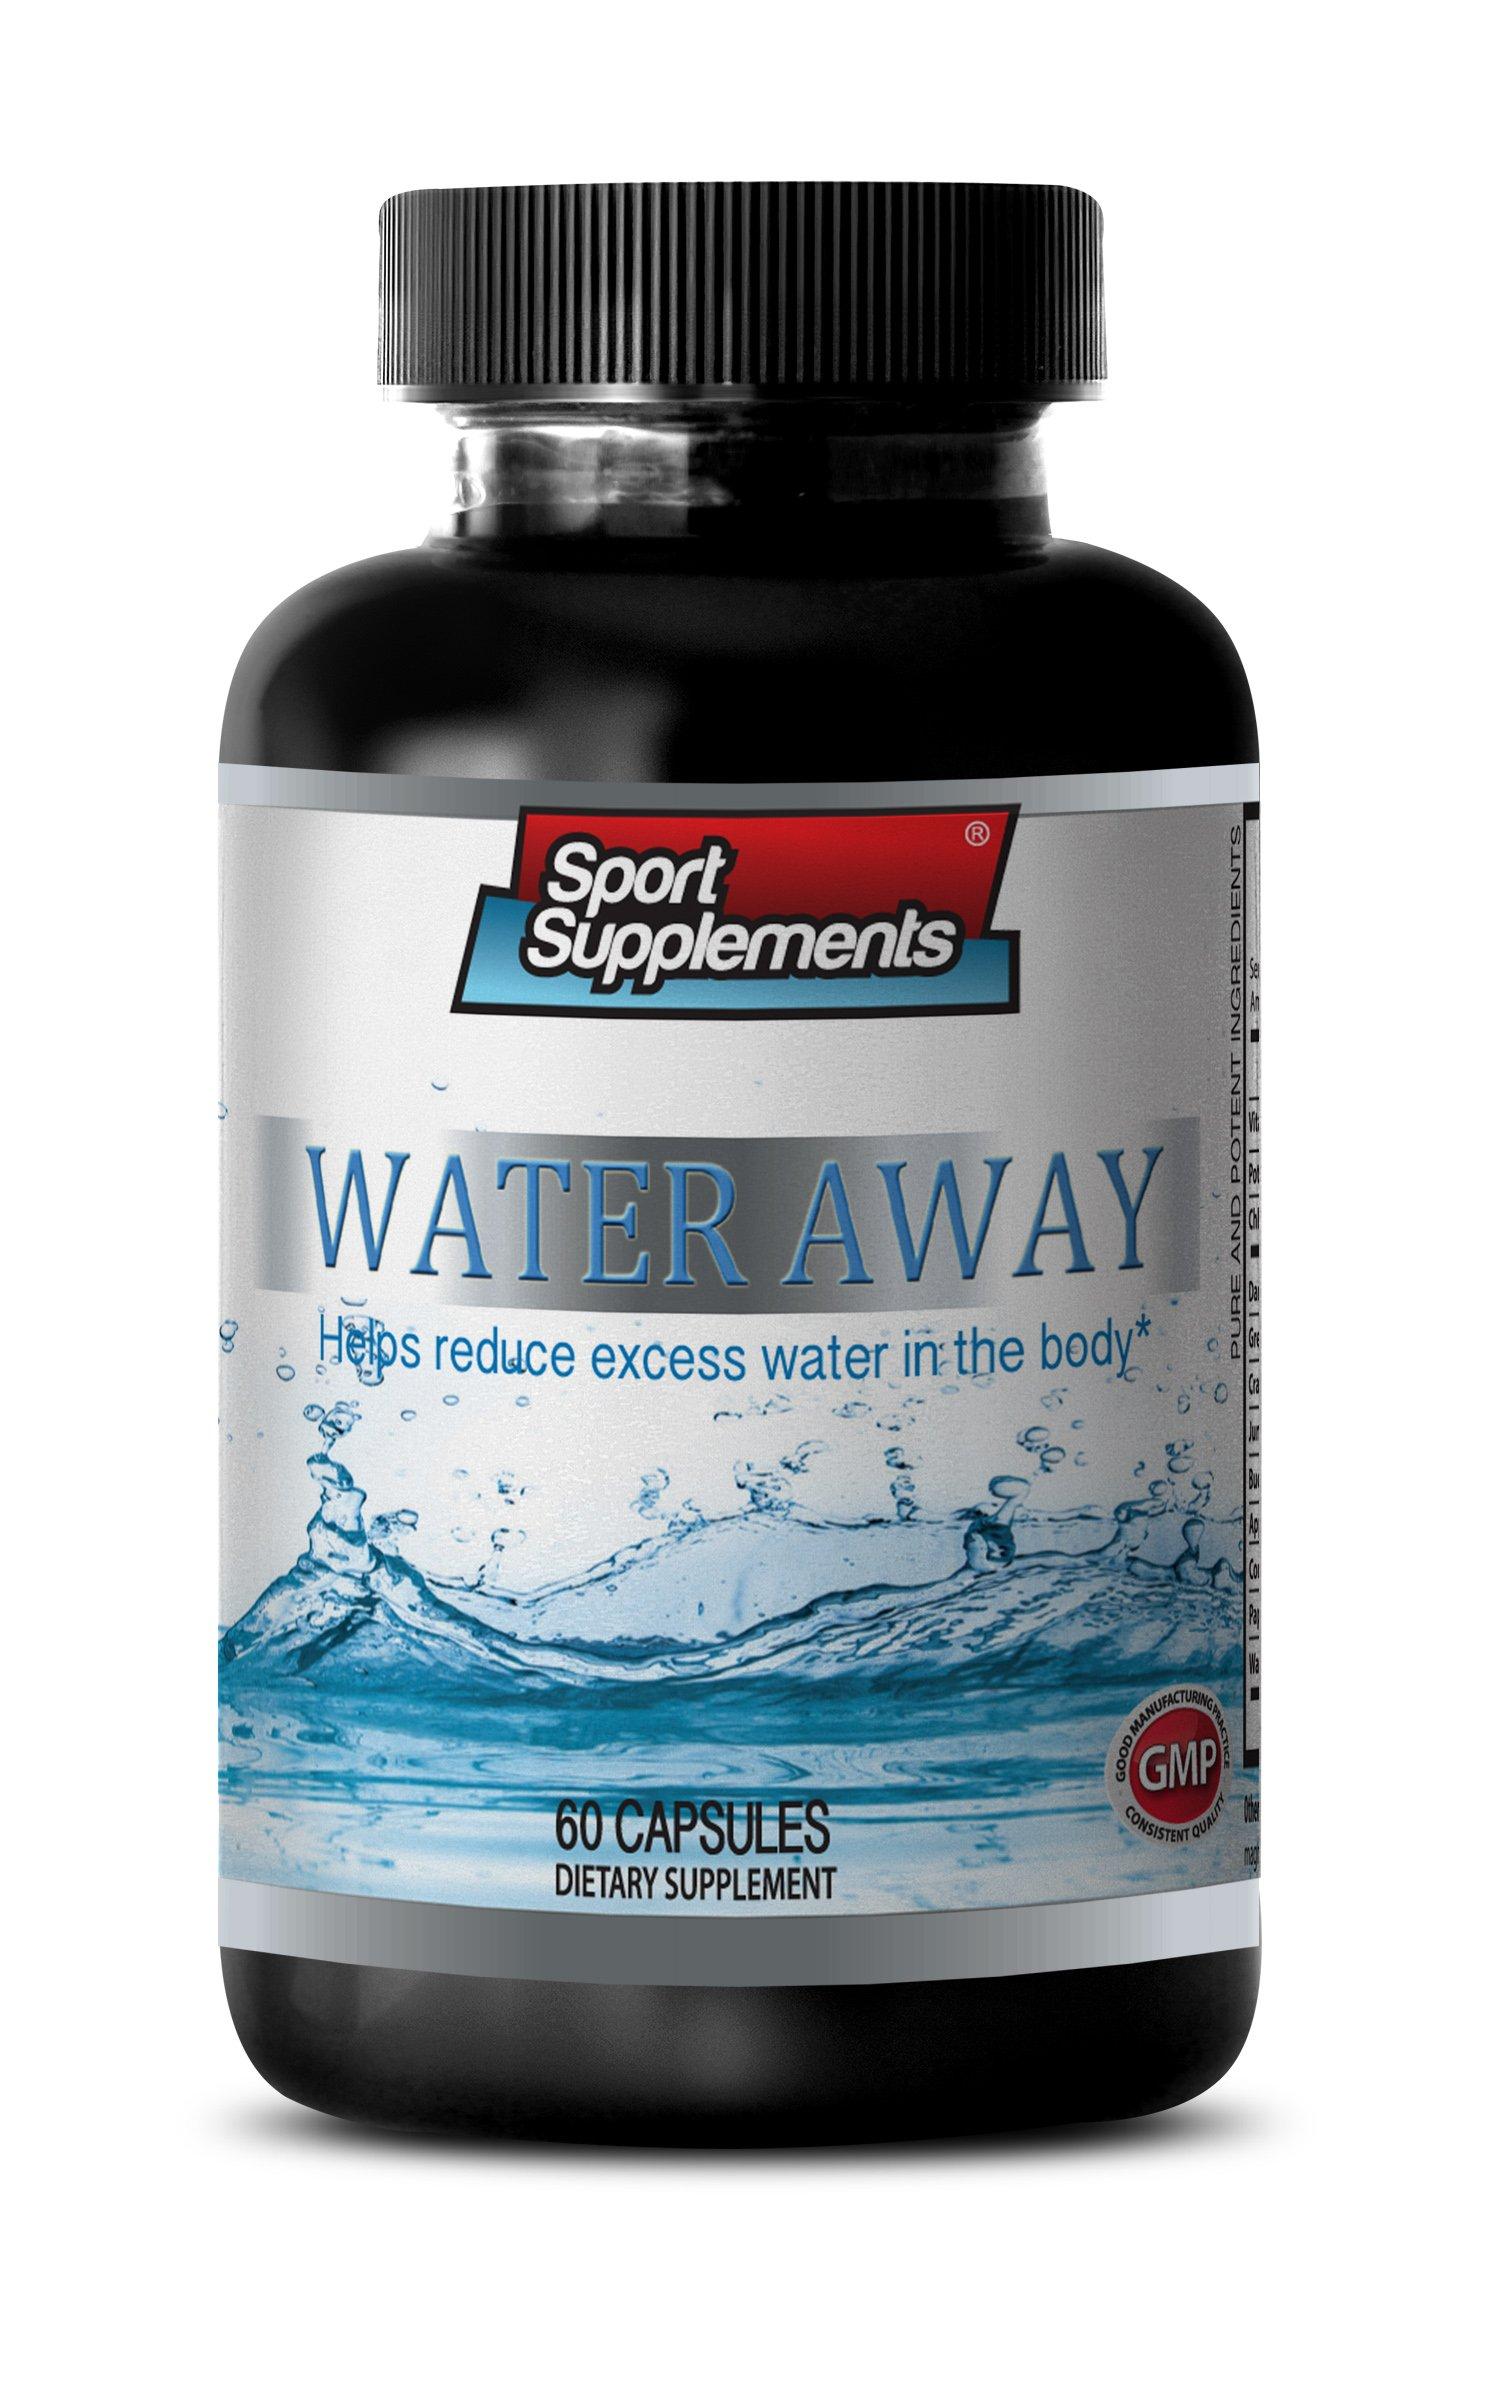 Anti bloating pills - WATER AWAY NATURAL DIURETIC COMPLEX - Potassium Dietary Supplement - 1 Bottle 60 Capsules